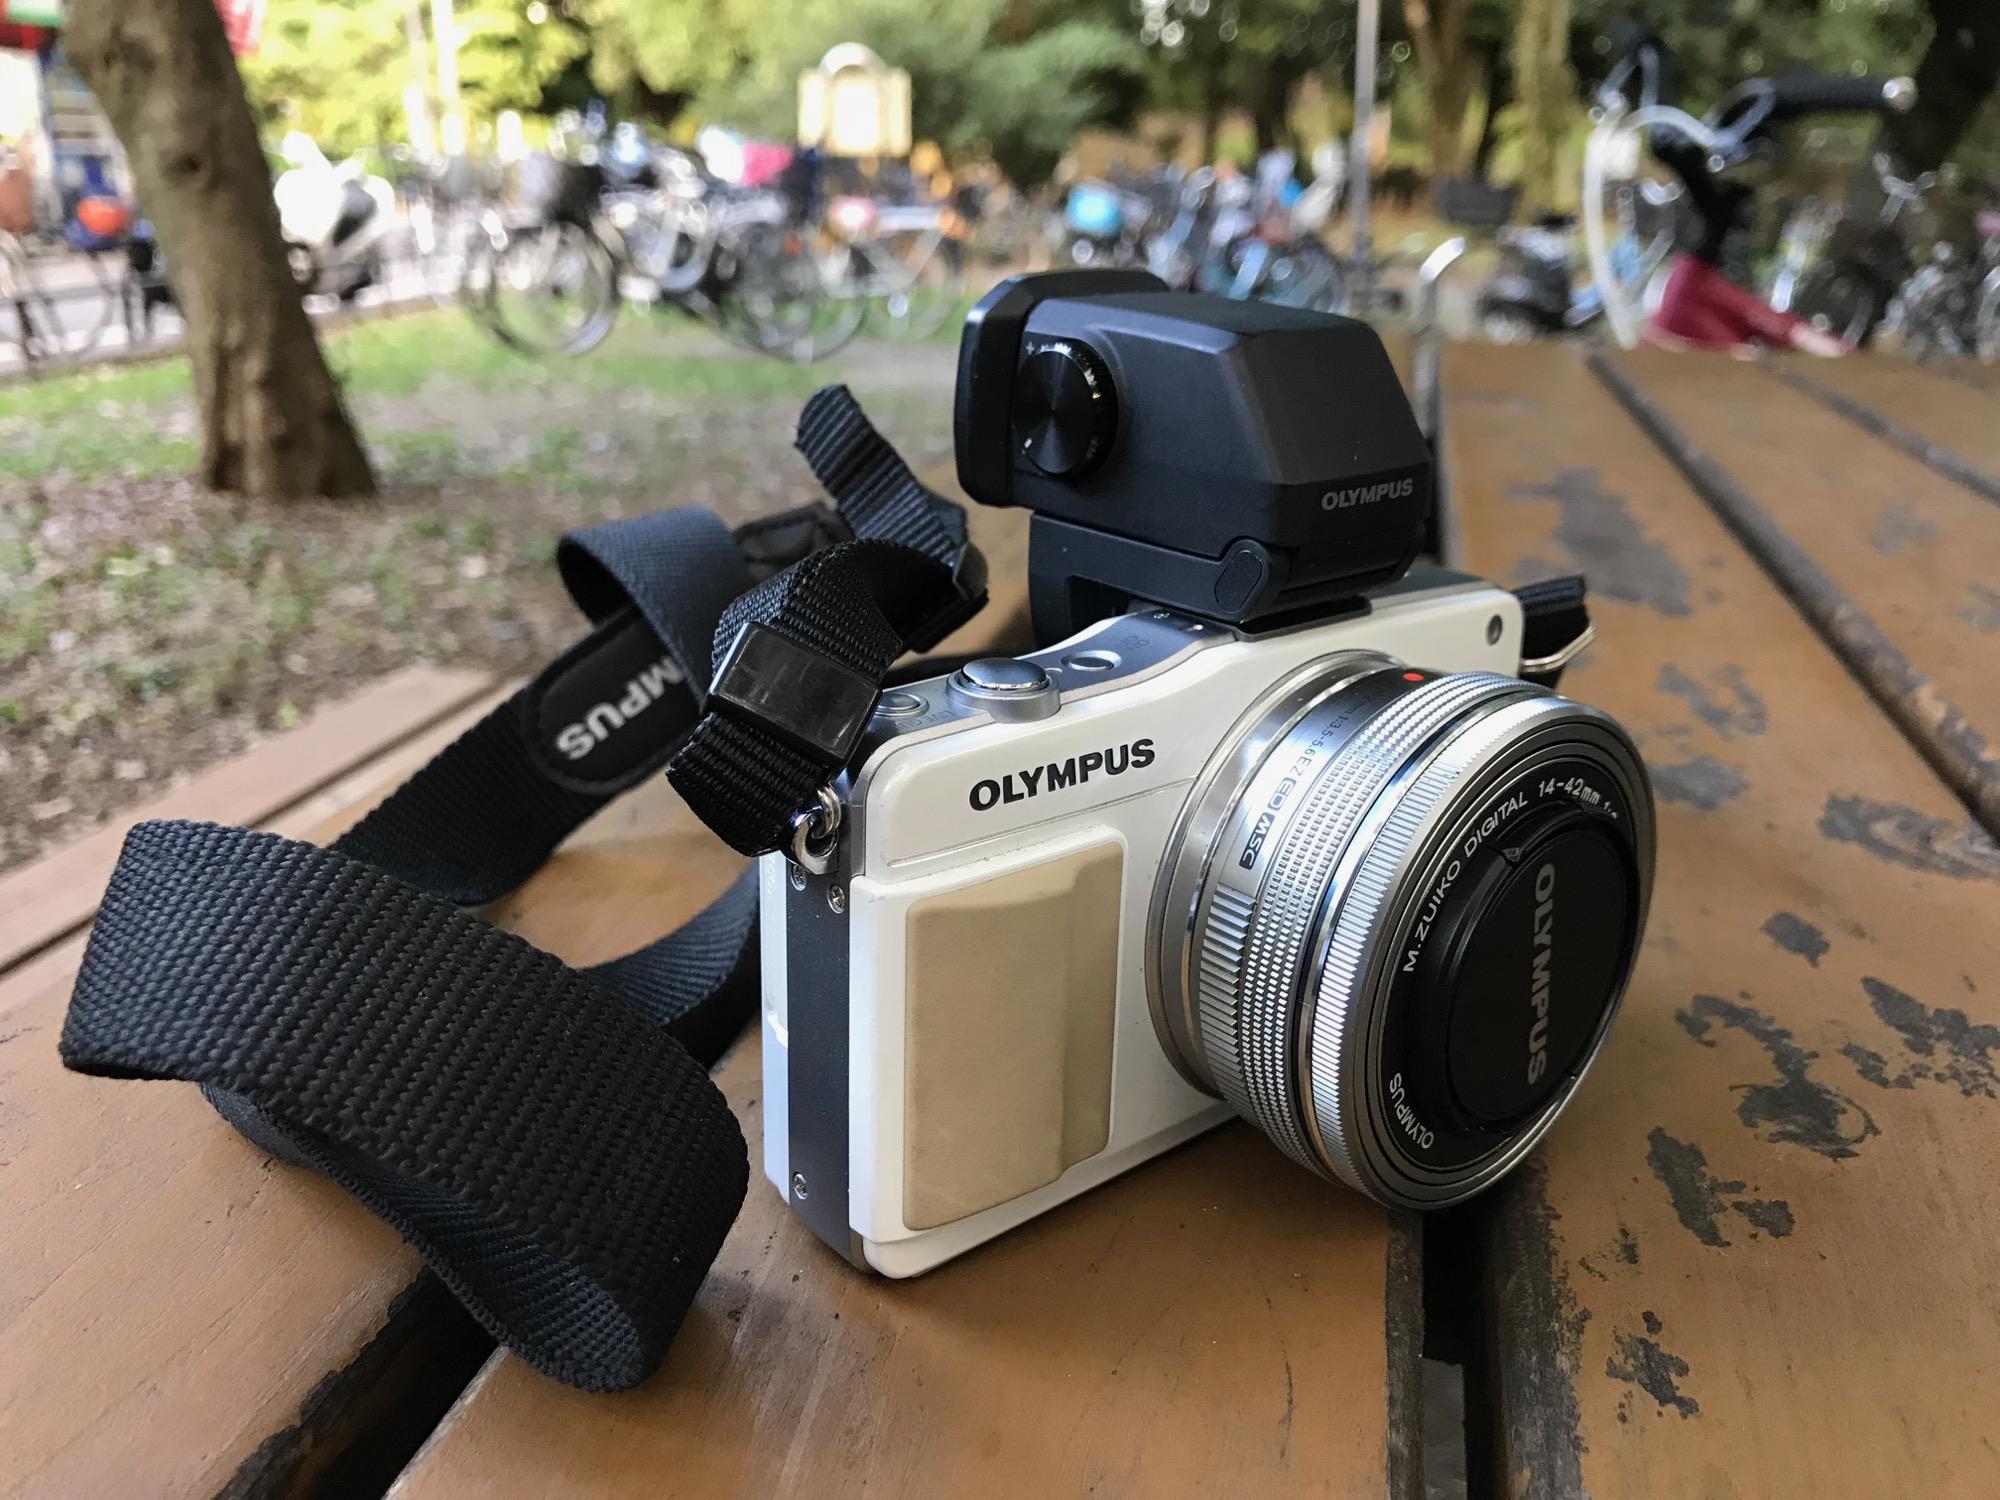 Olympus E-PM2 + 14-42mm